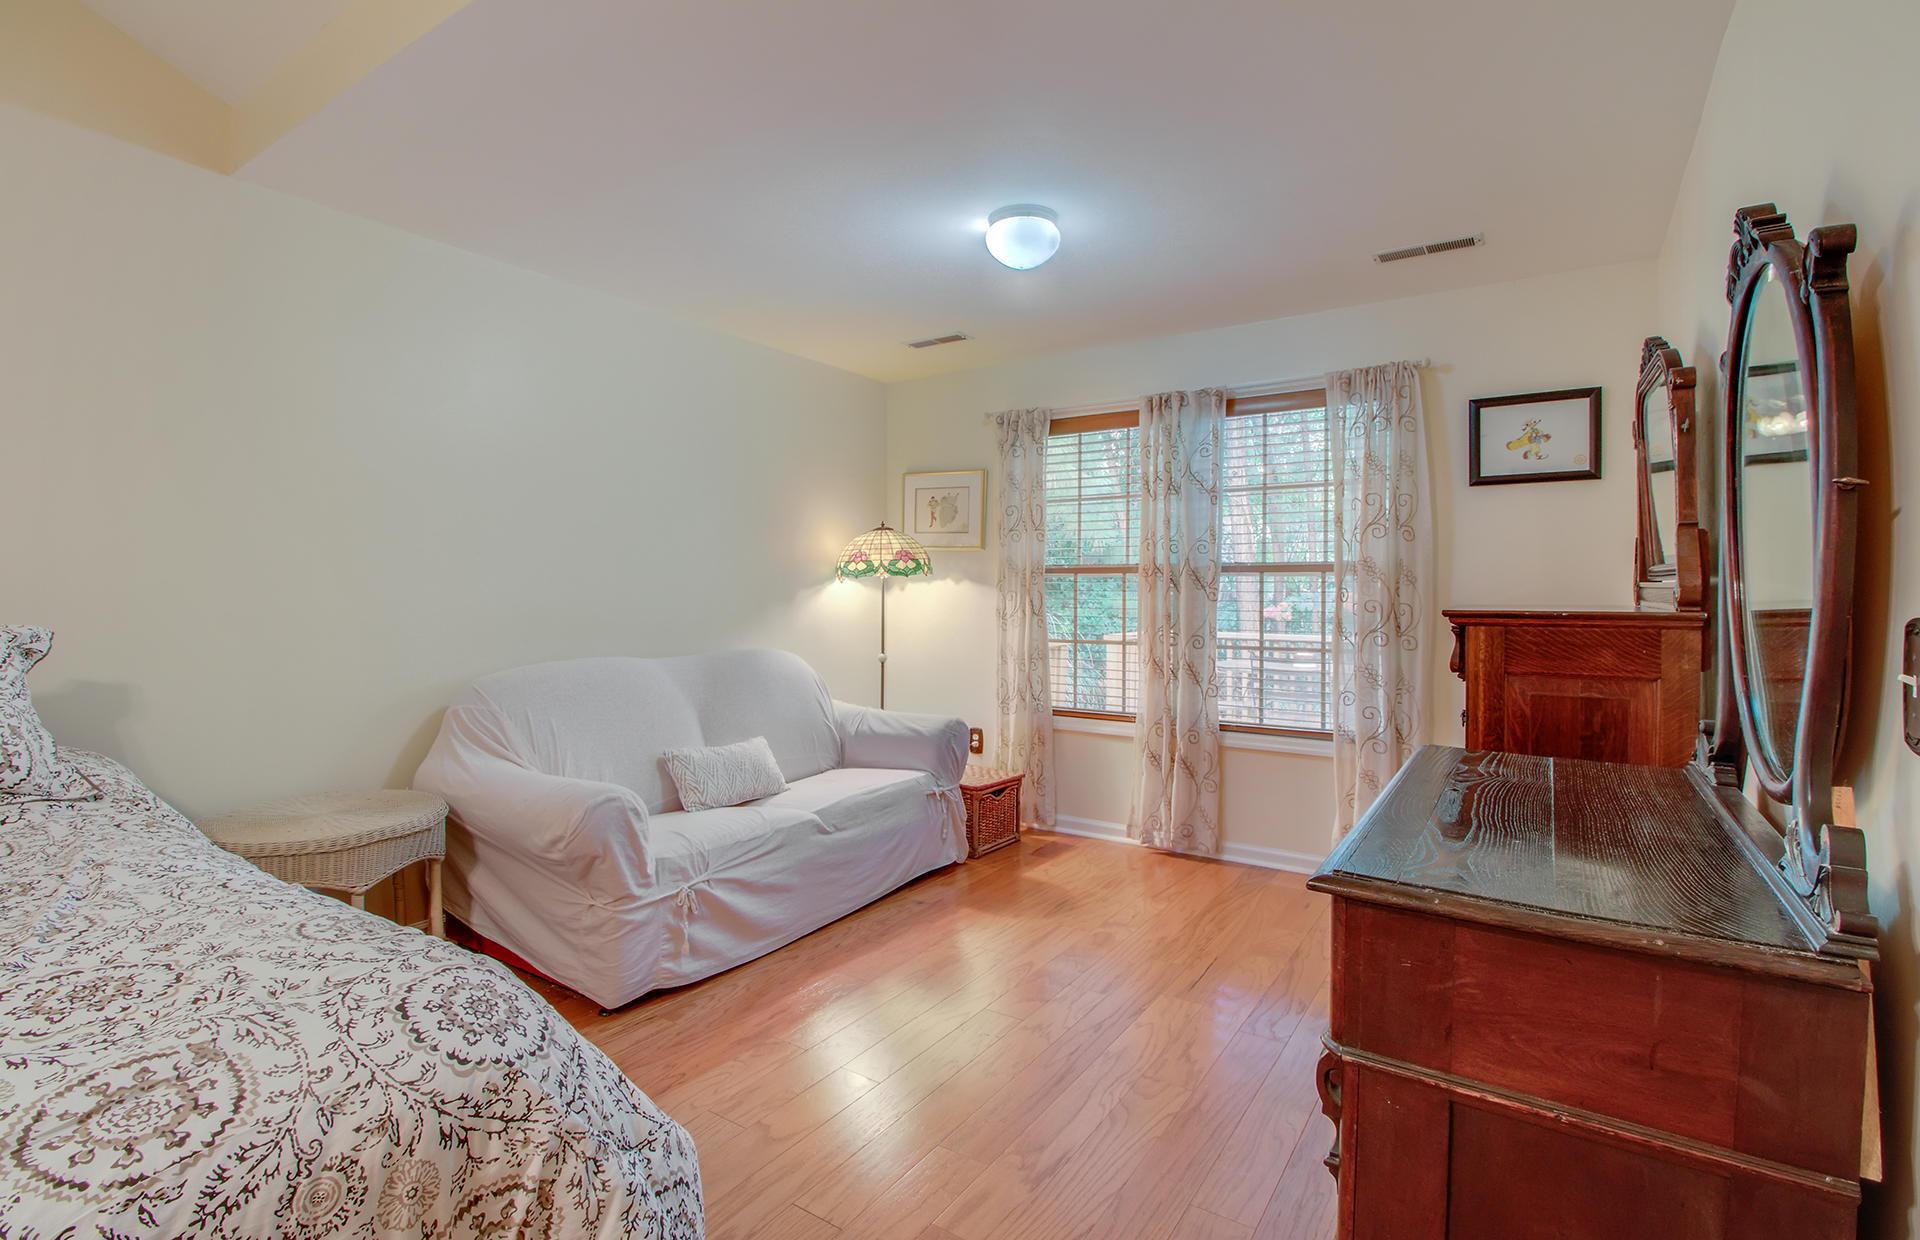 Park West Homes For Sale - 1500 Wellesley, Mount Pleasant, SC - 5